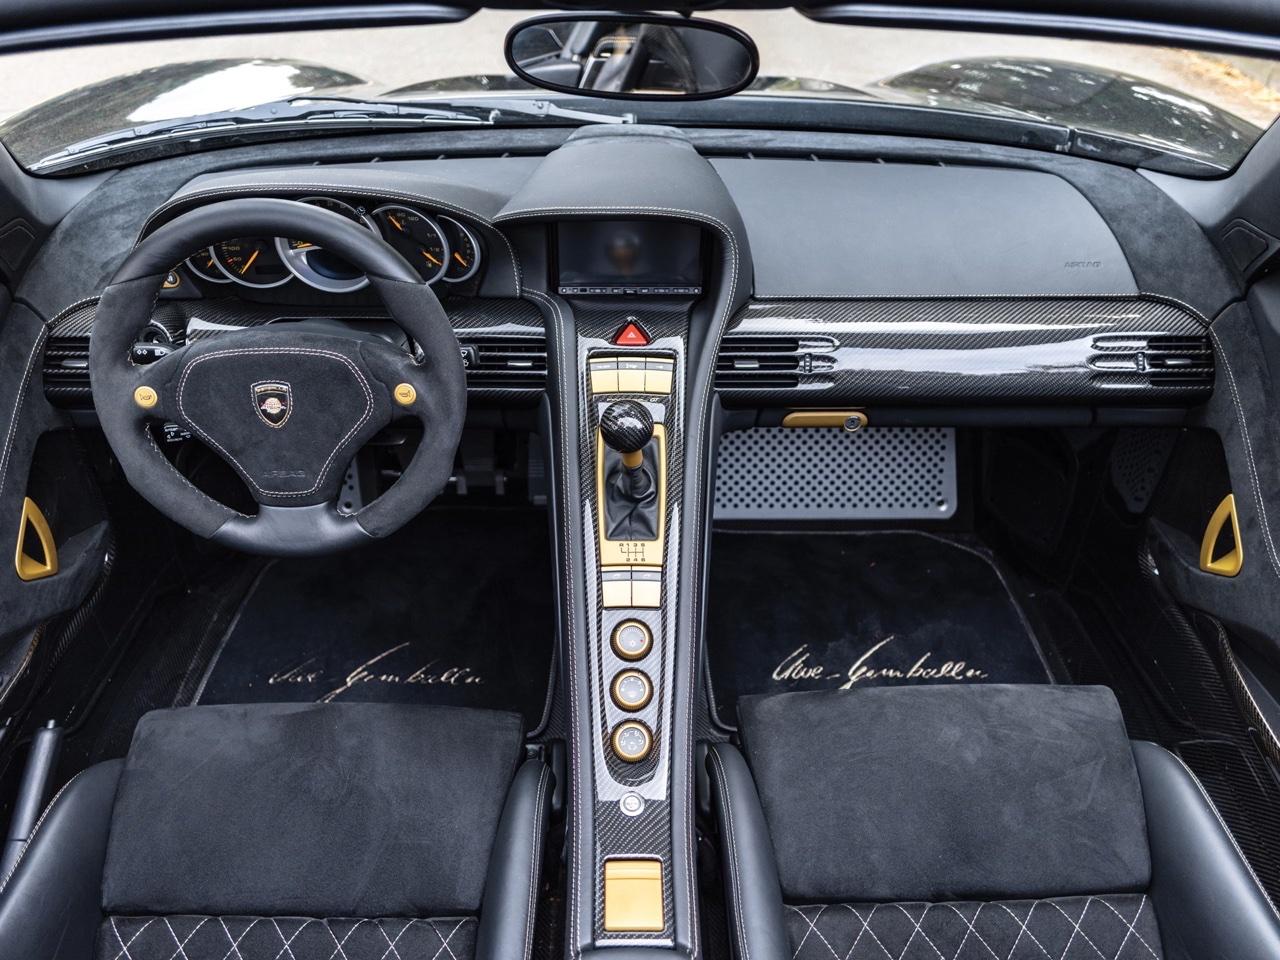 Porsche Carrera GT -> Gemballa Mirage GT Gold Edition : La caisse à Samuel ! 16